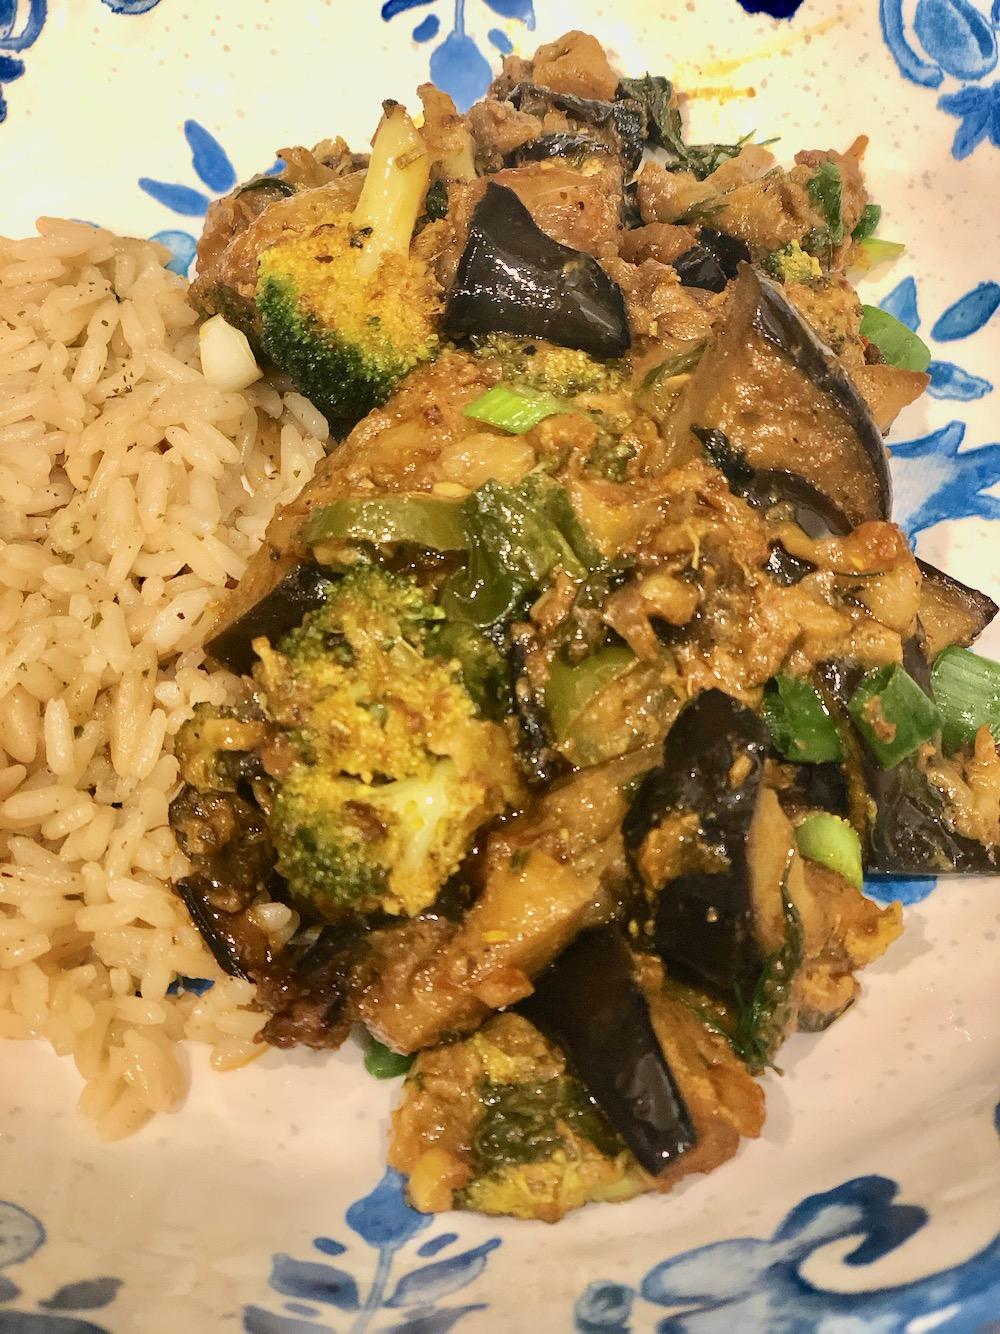 Serve your eggplant broccoli dijonnaise with rice pilaf